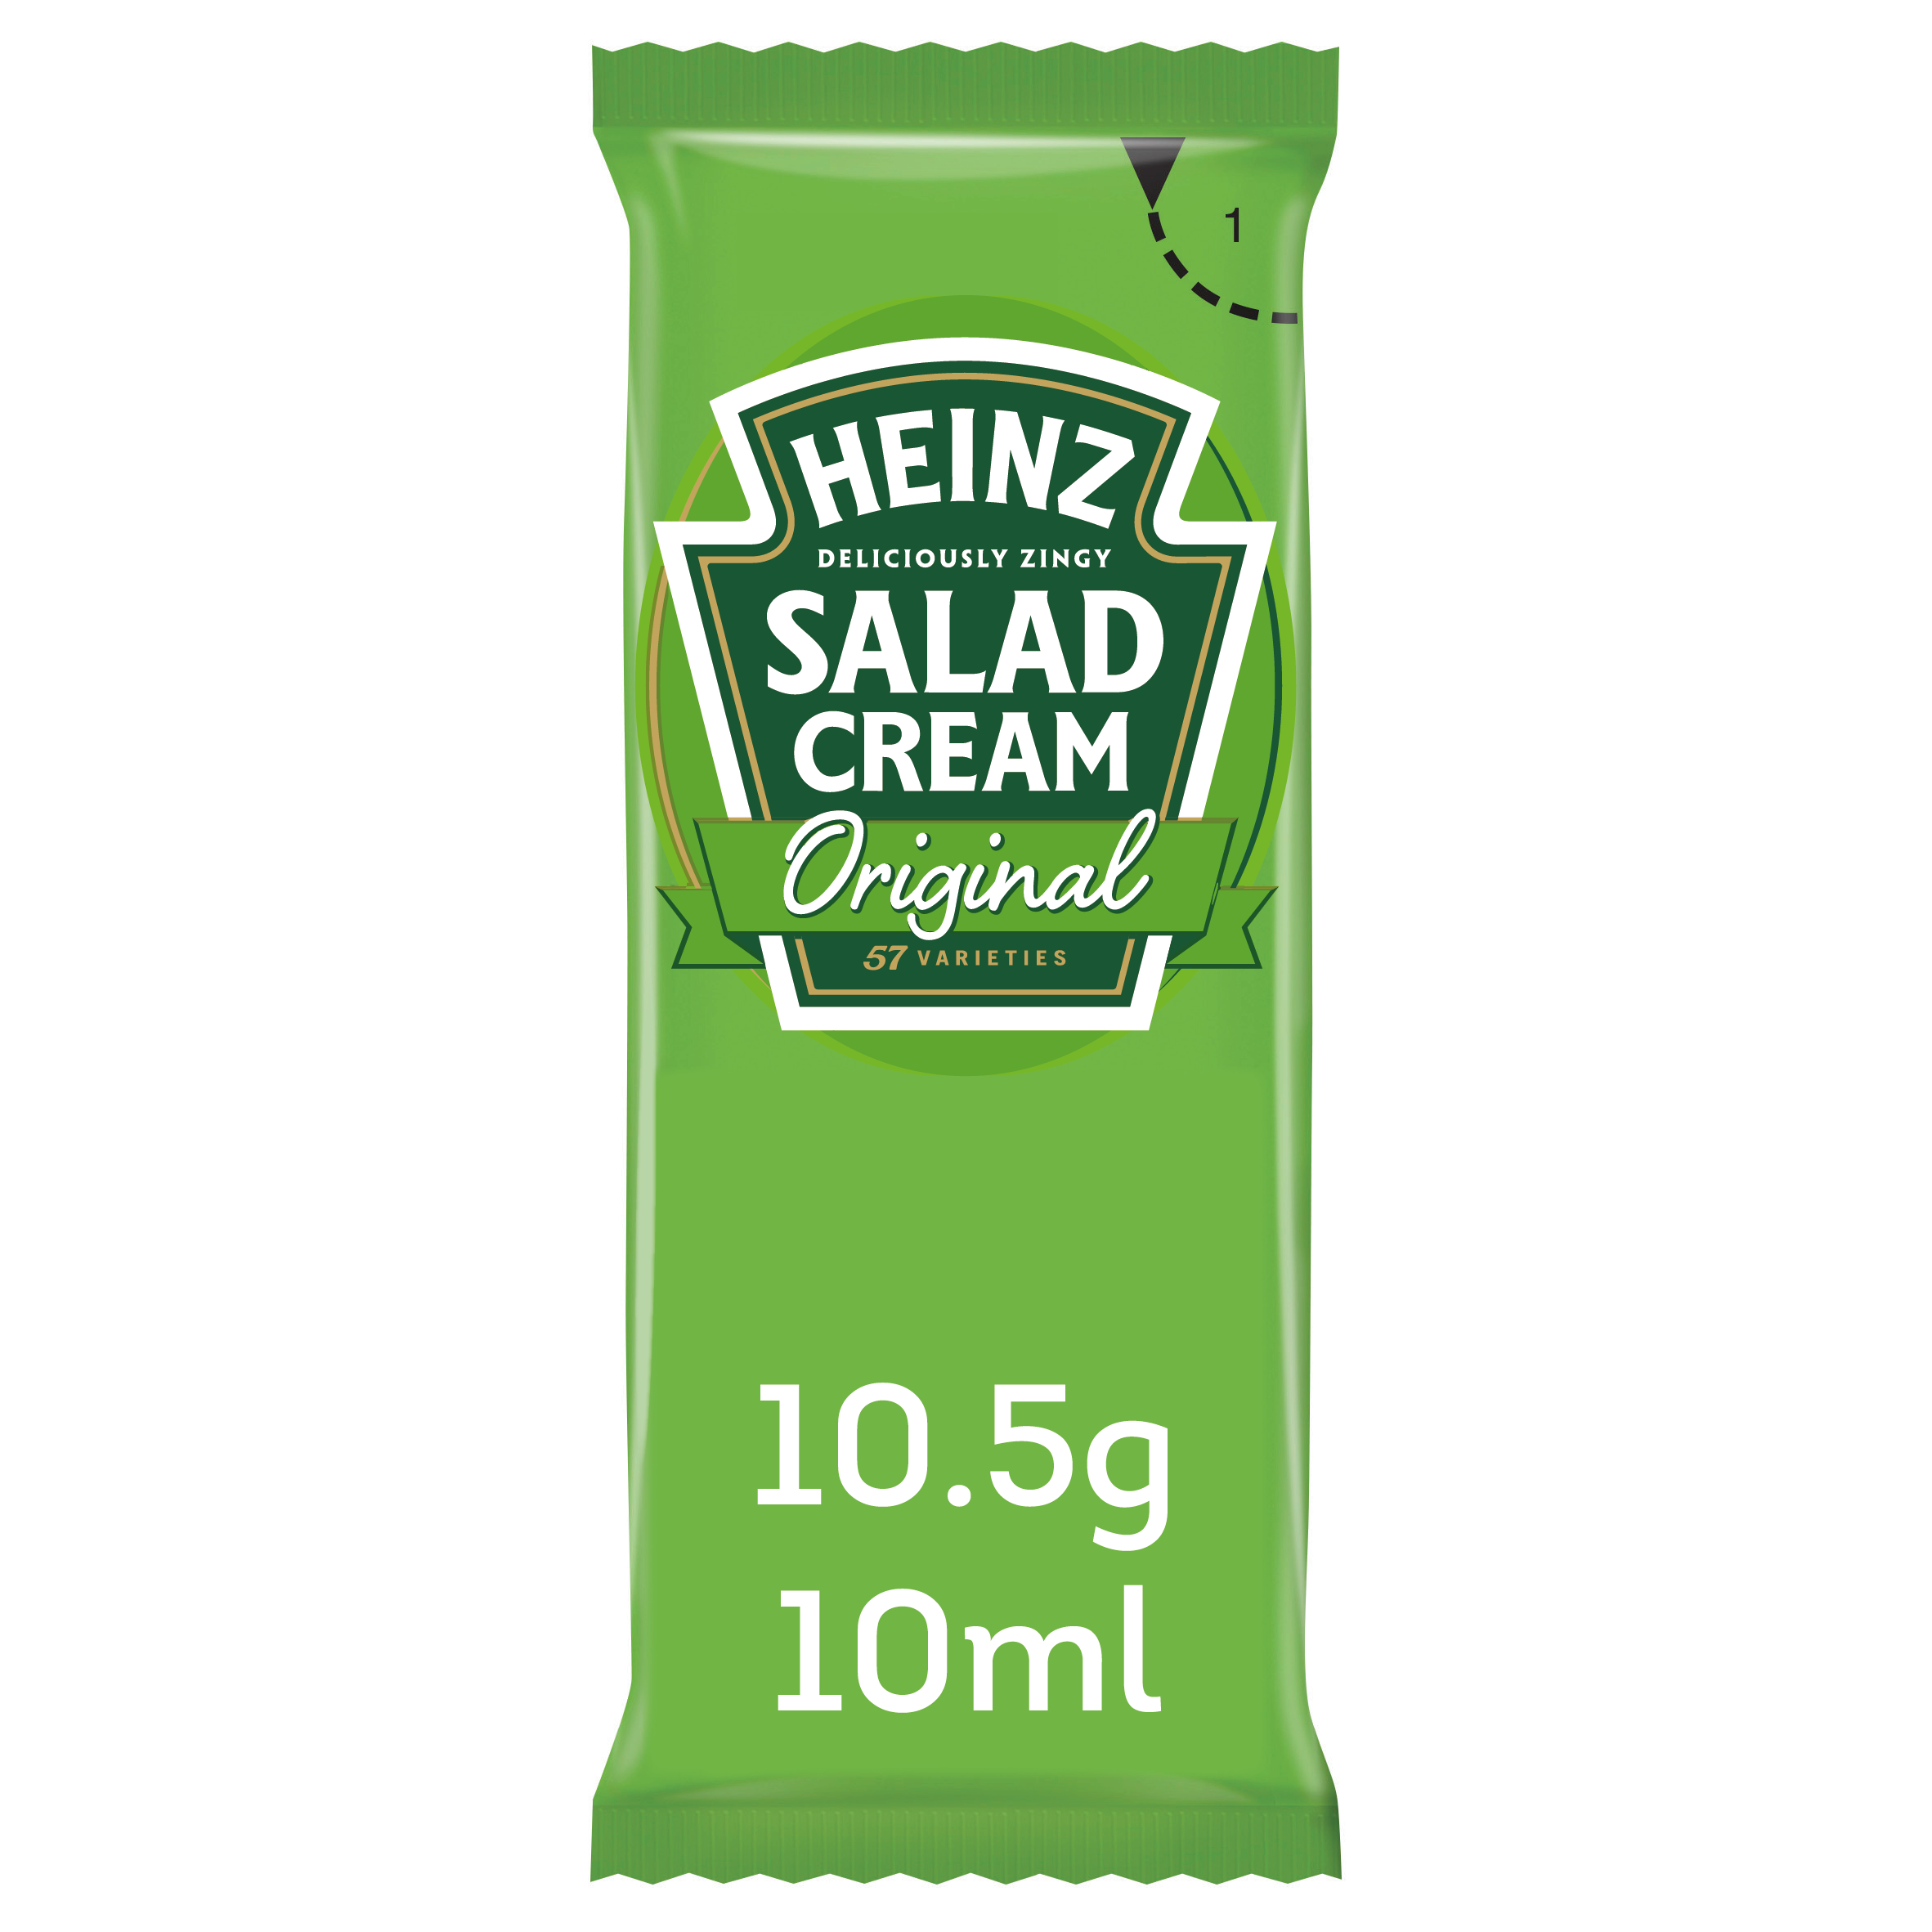 Heinz Salad Cream 10ml Sachet image